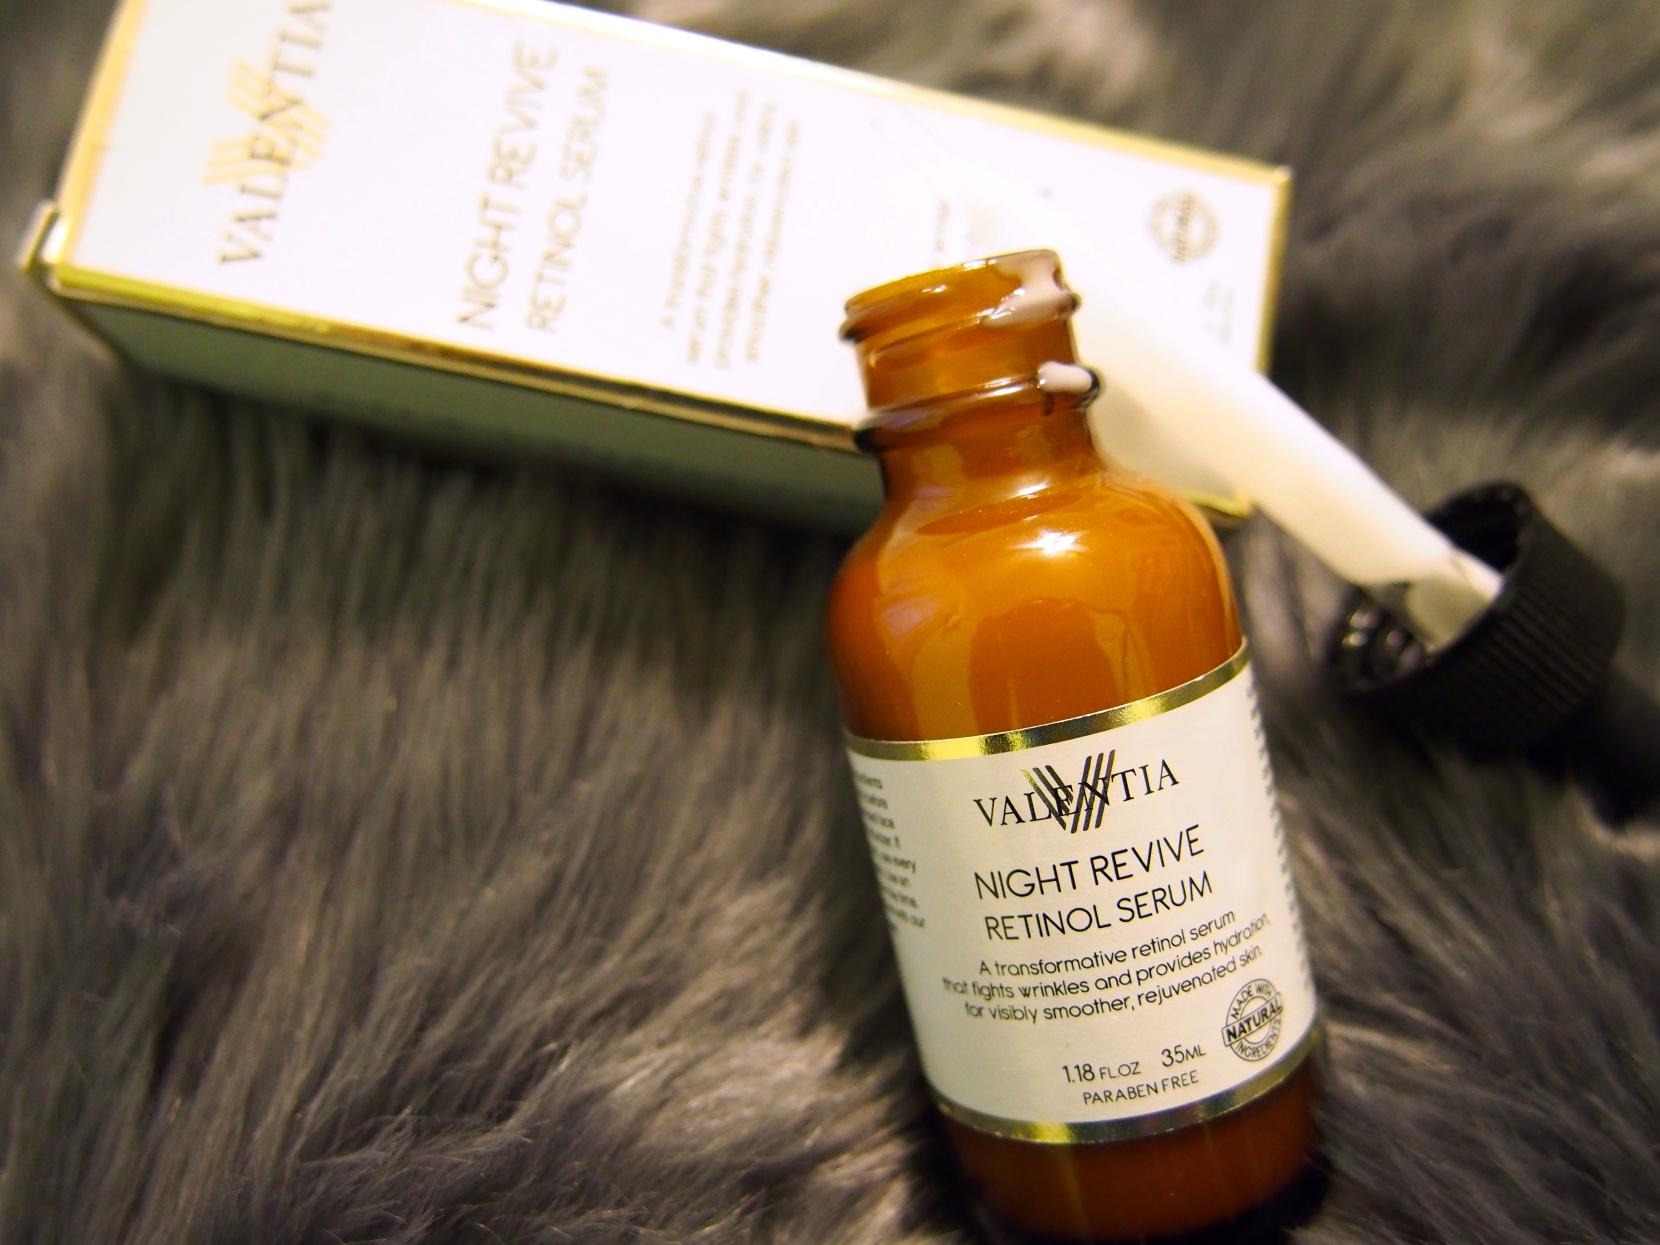 Valentia Night Revive Retinol Serum Product Review